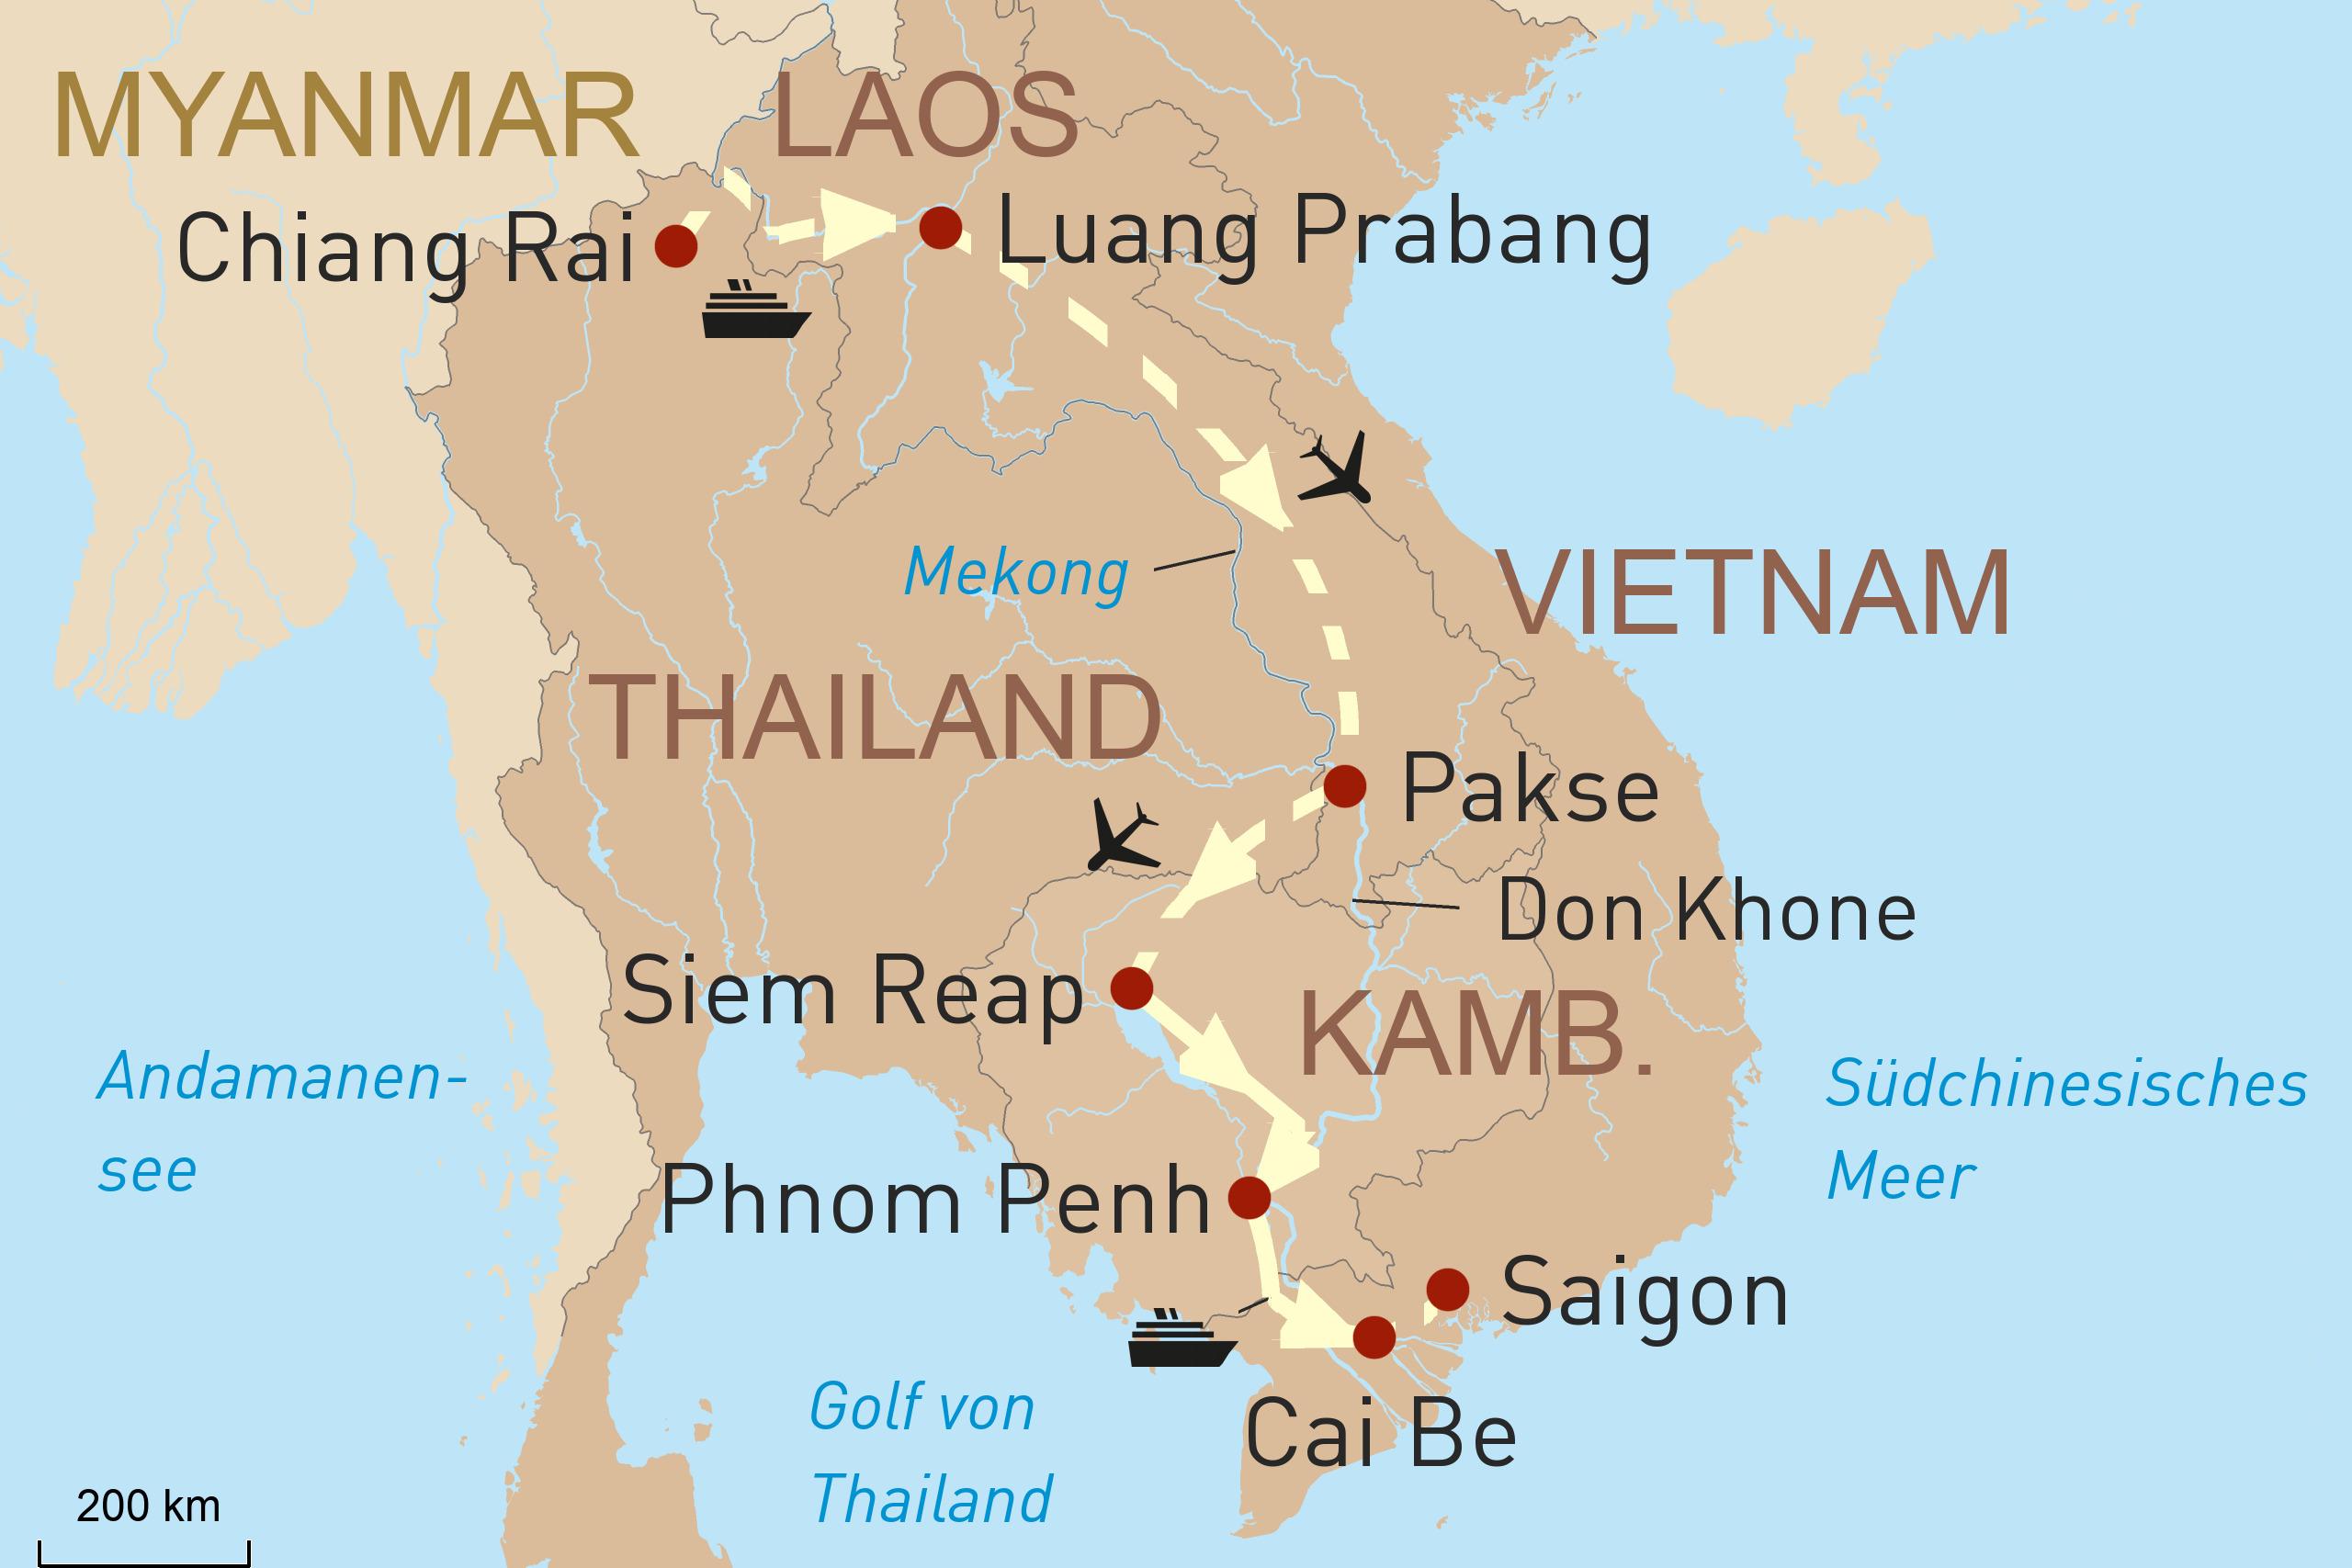 Mekong komplett - Vom Goldenen Dreieck bis zum Delta